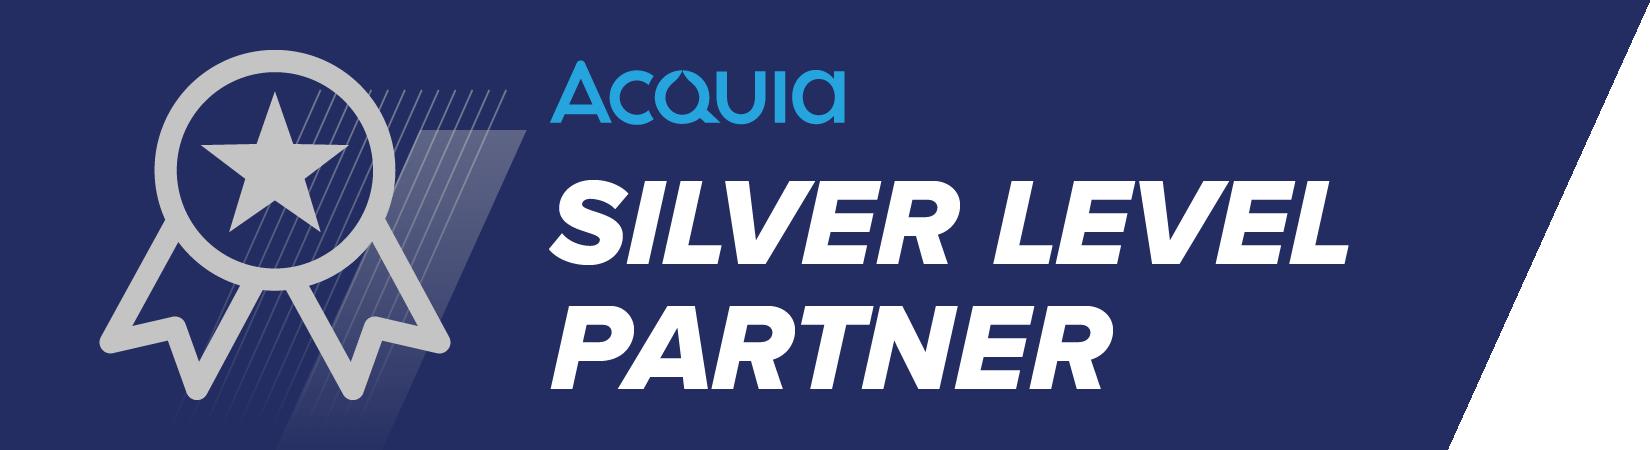 Acquia Silver Partner